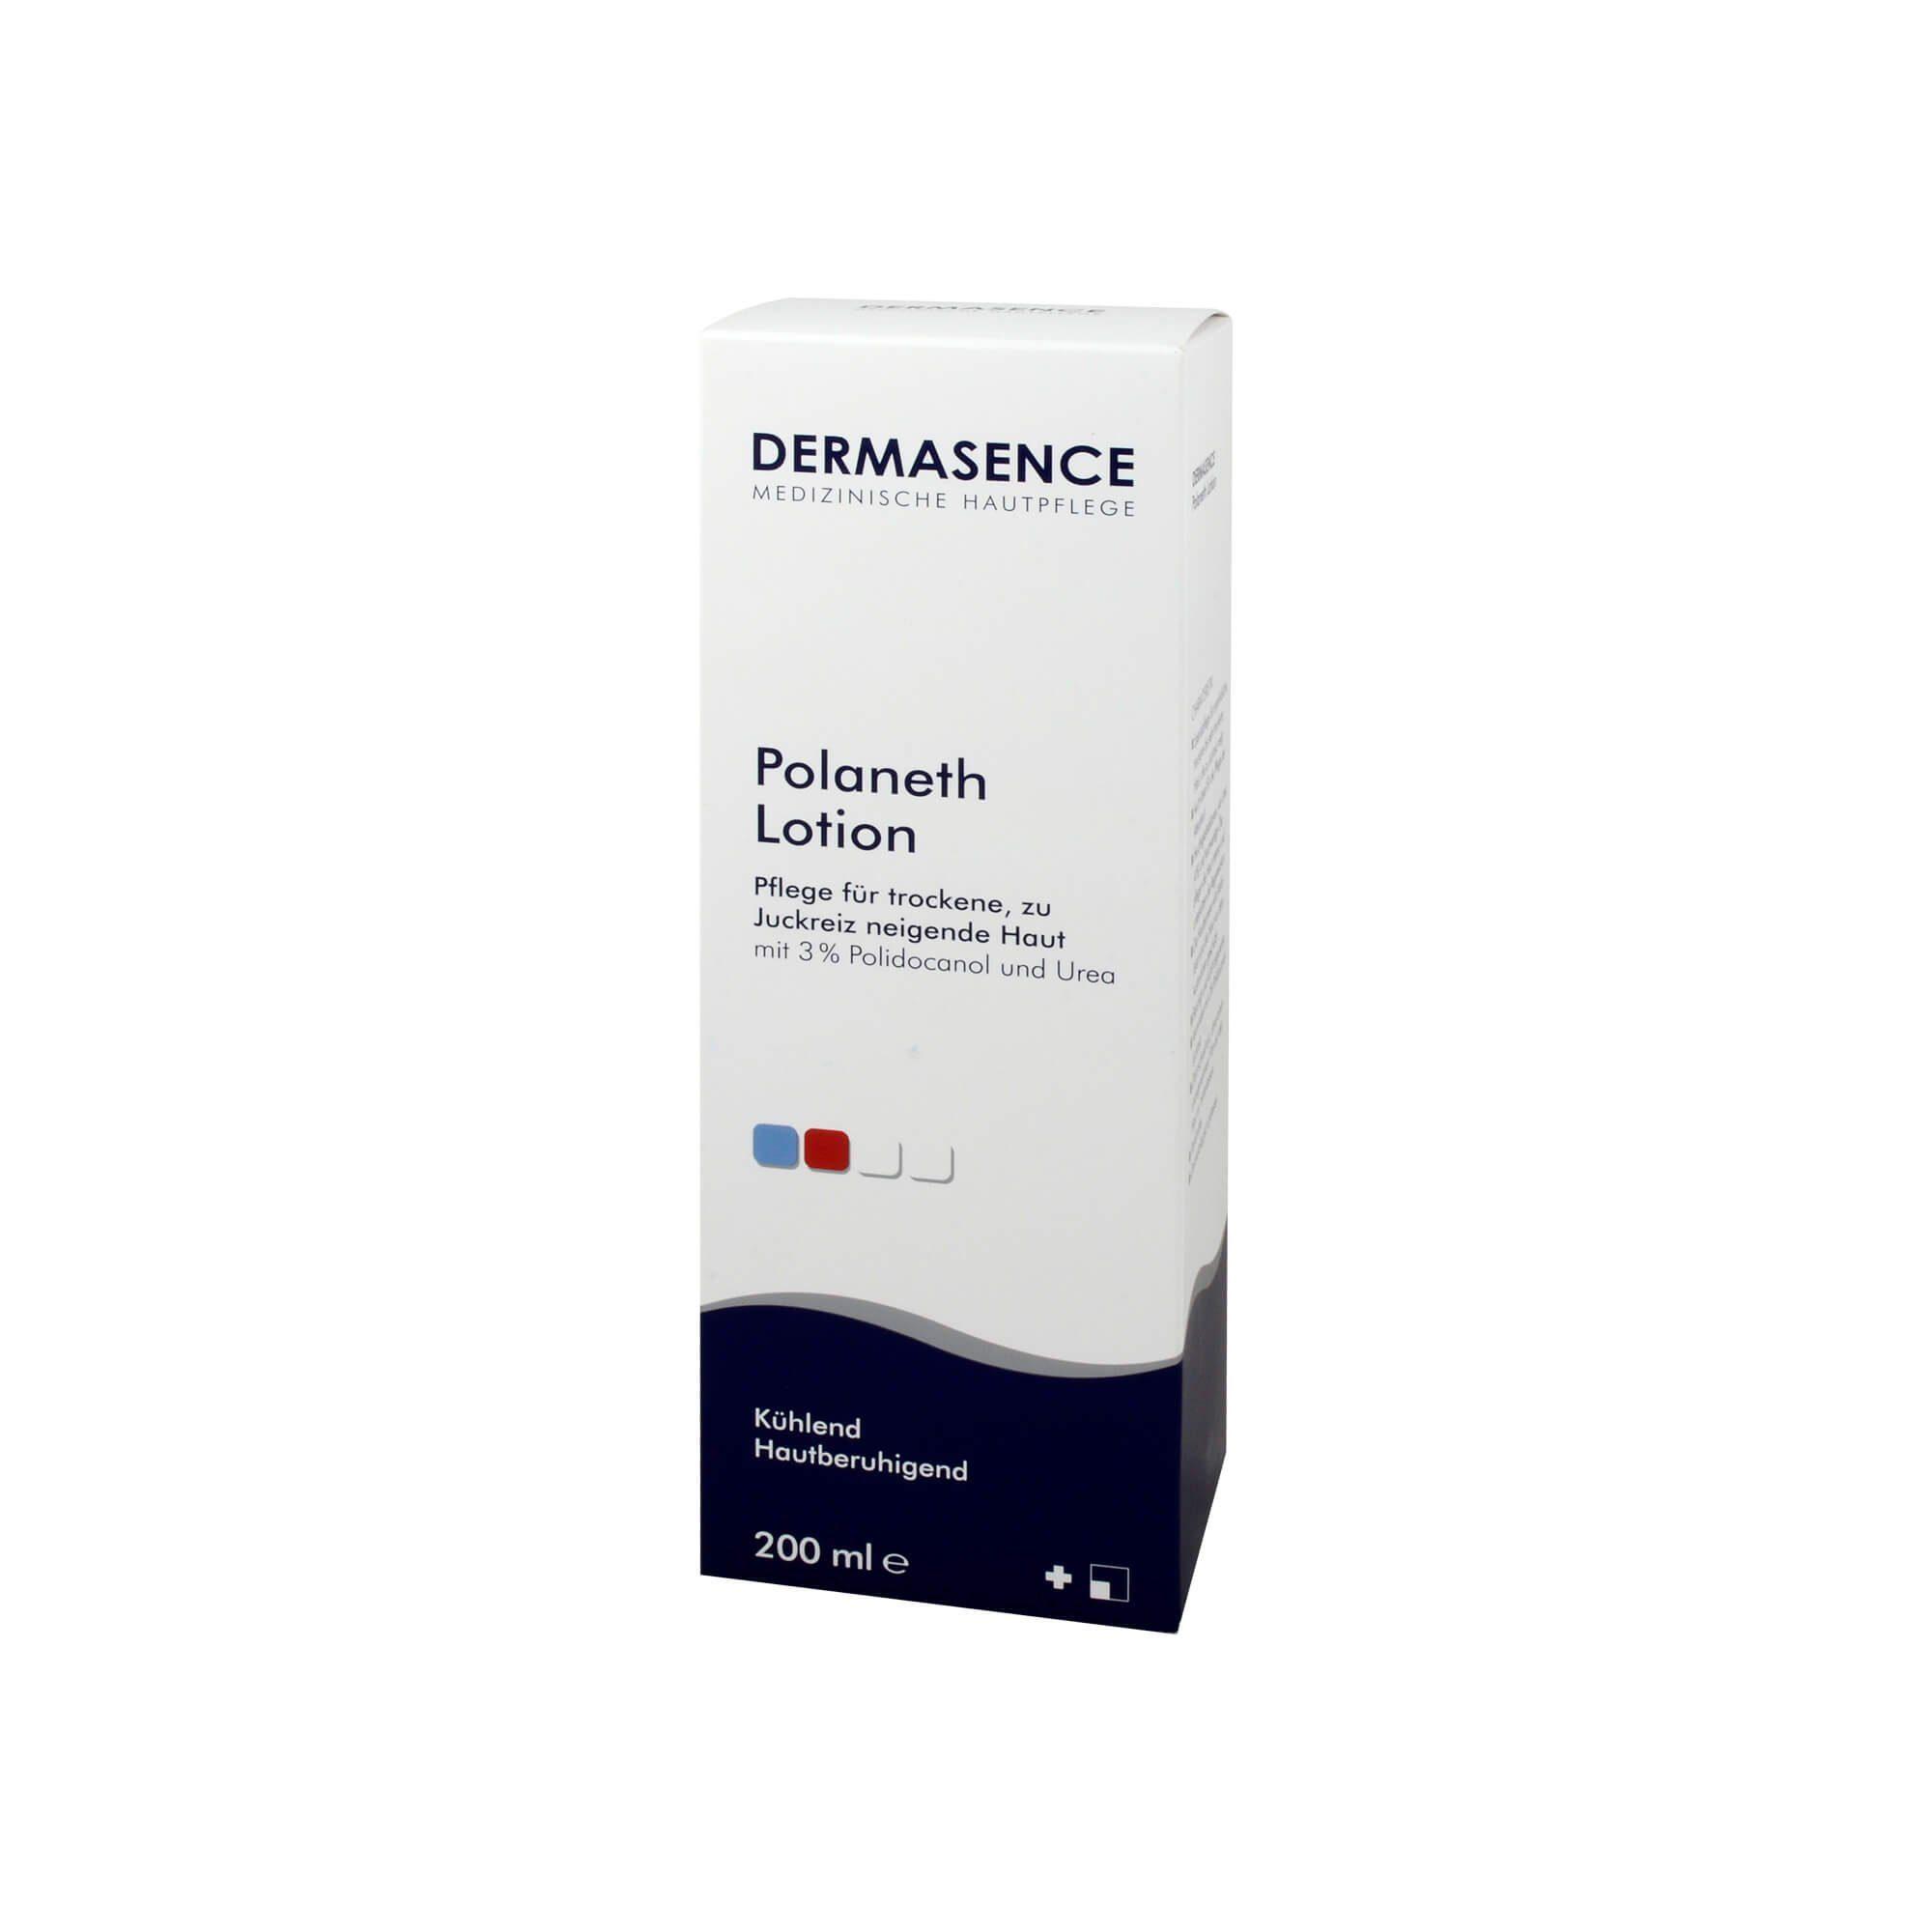 DERMASENCE Polaneth Lotion , 200 ml